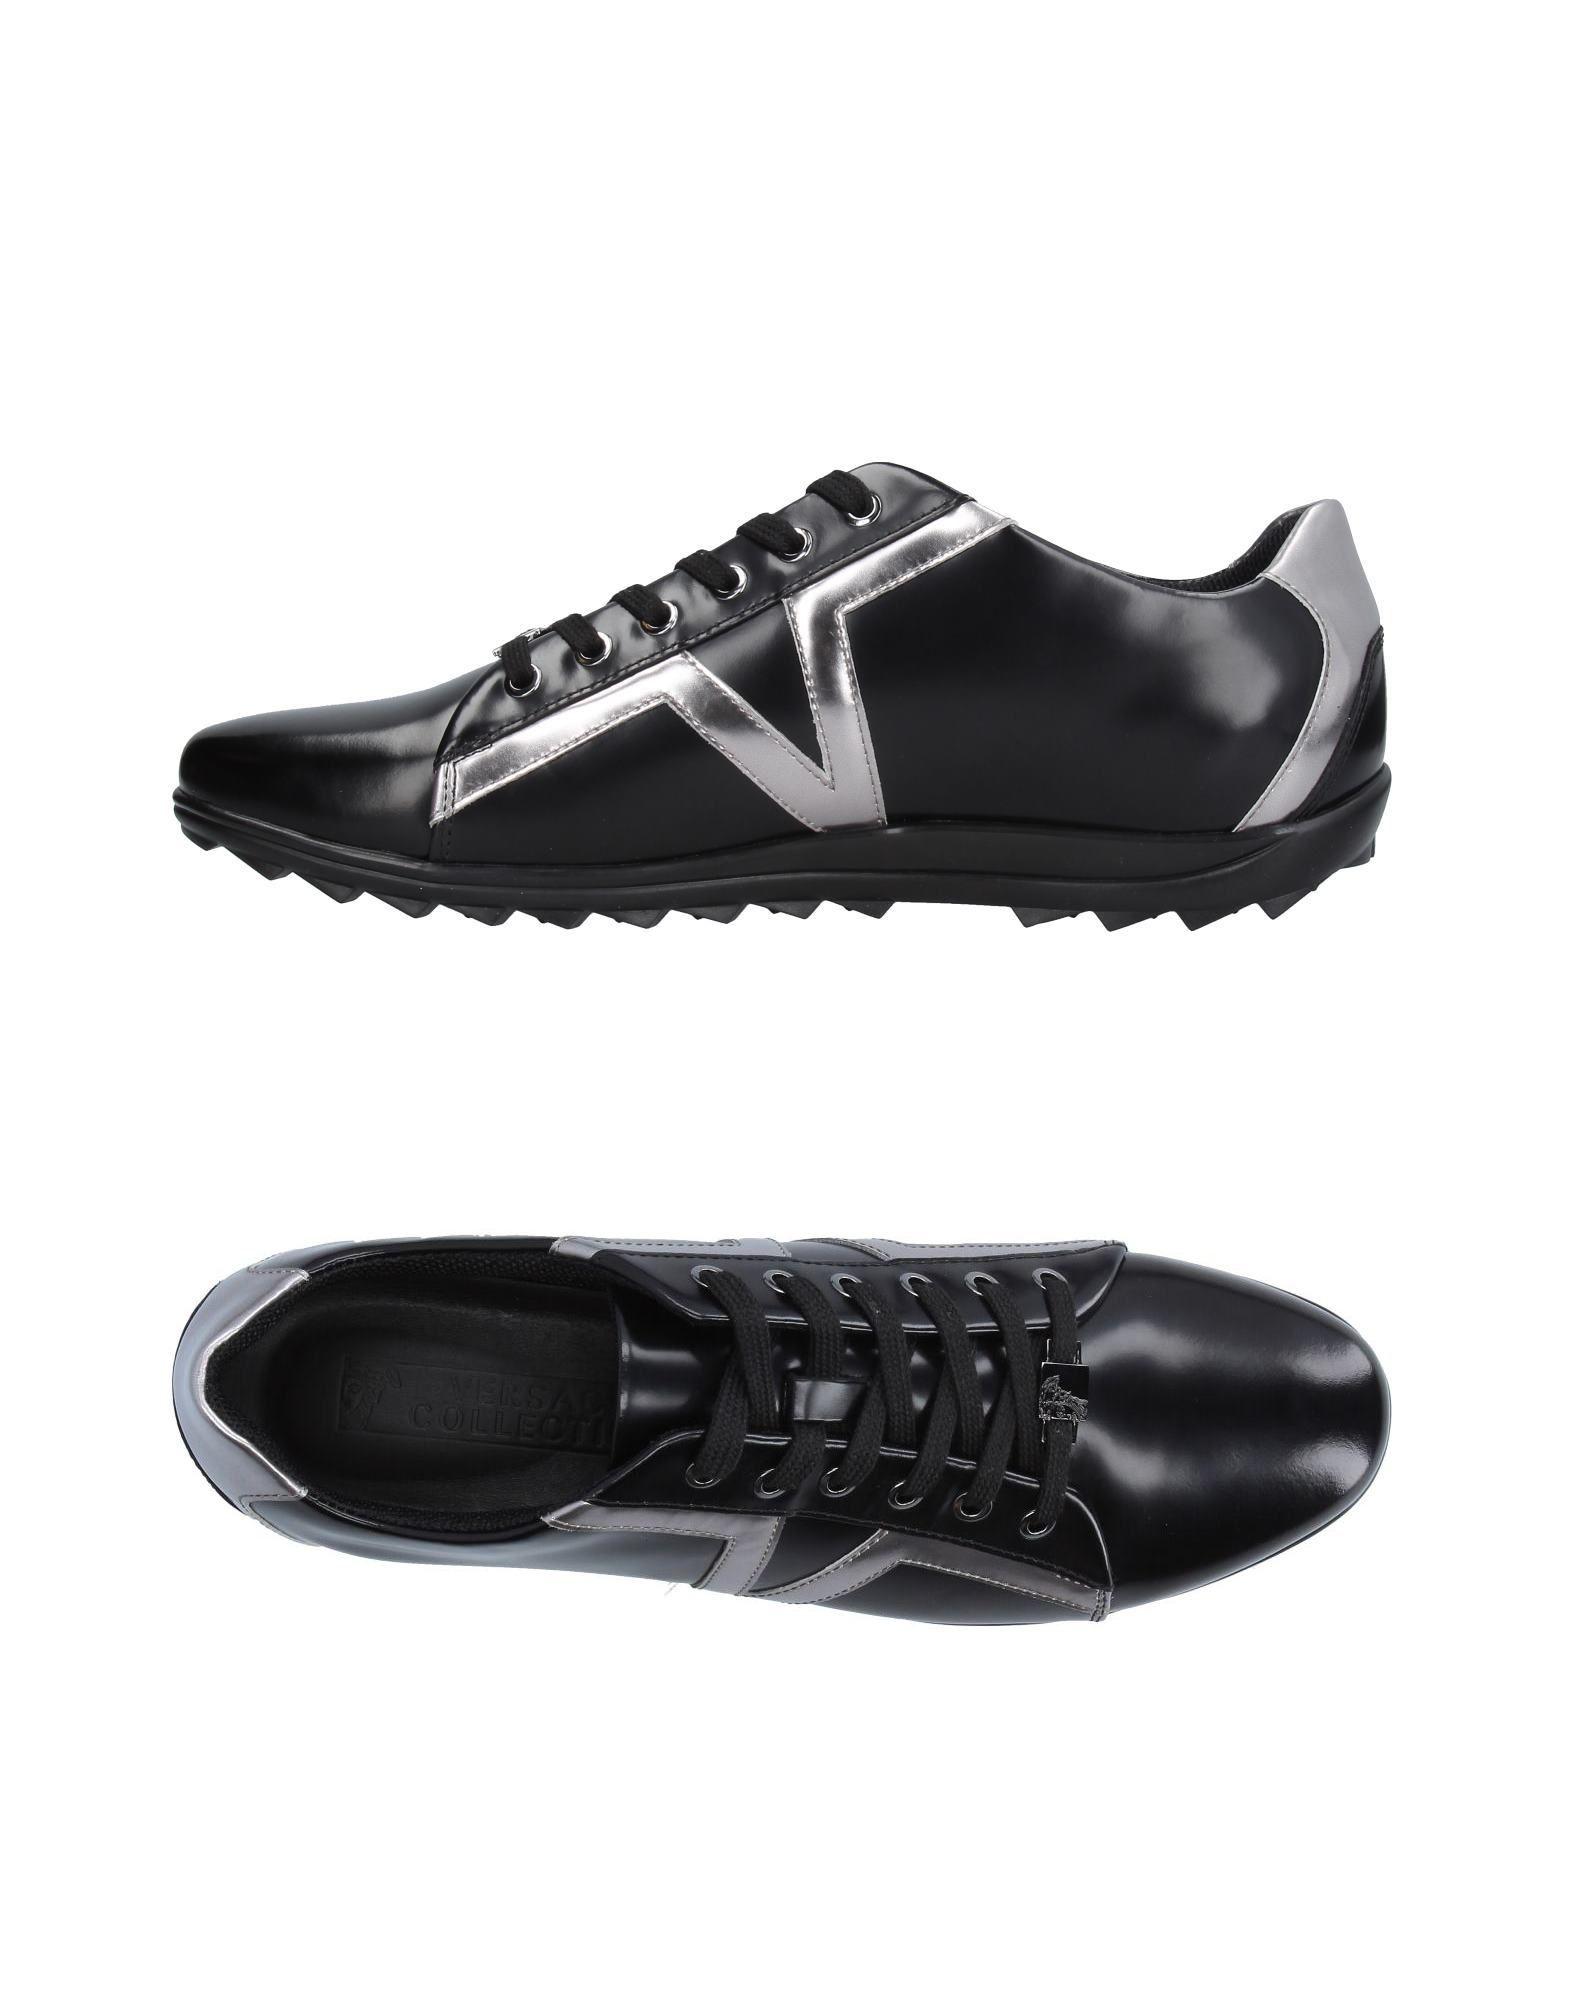 Versace Collection Sneakers Herren  11227767DV Gute Qualität beliebte Schuhe